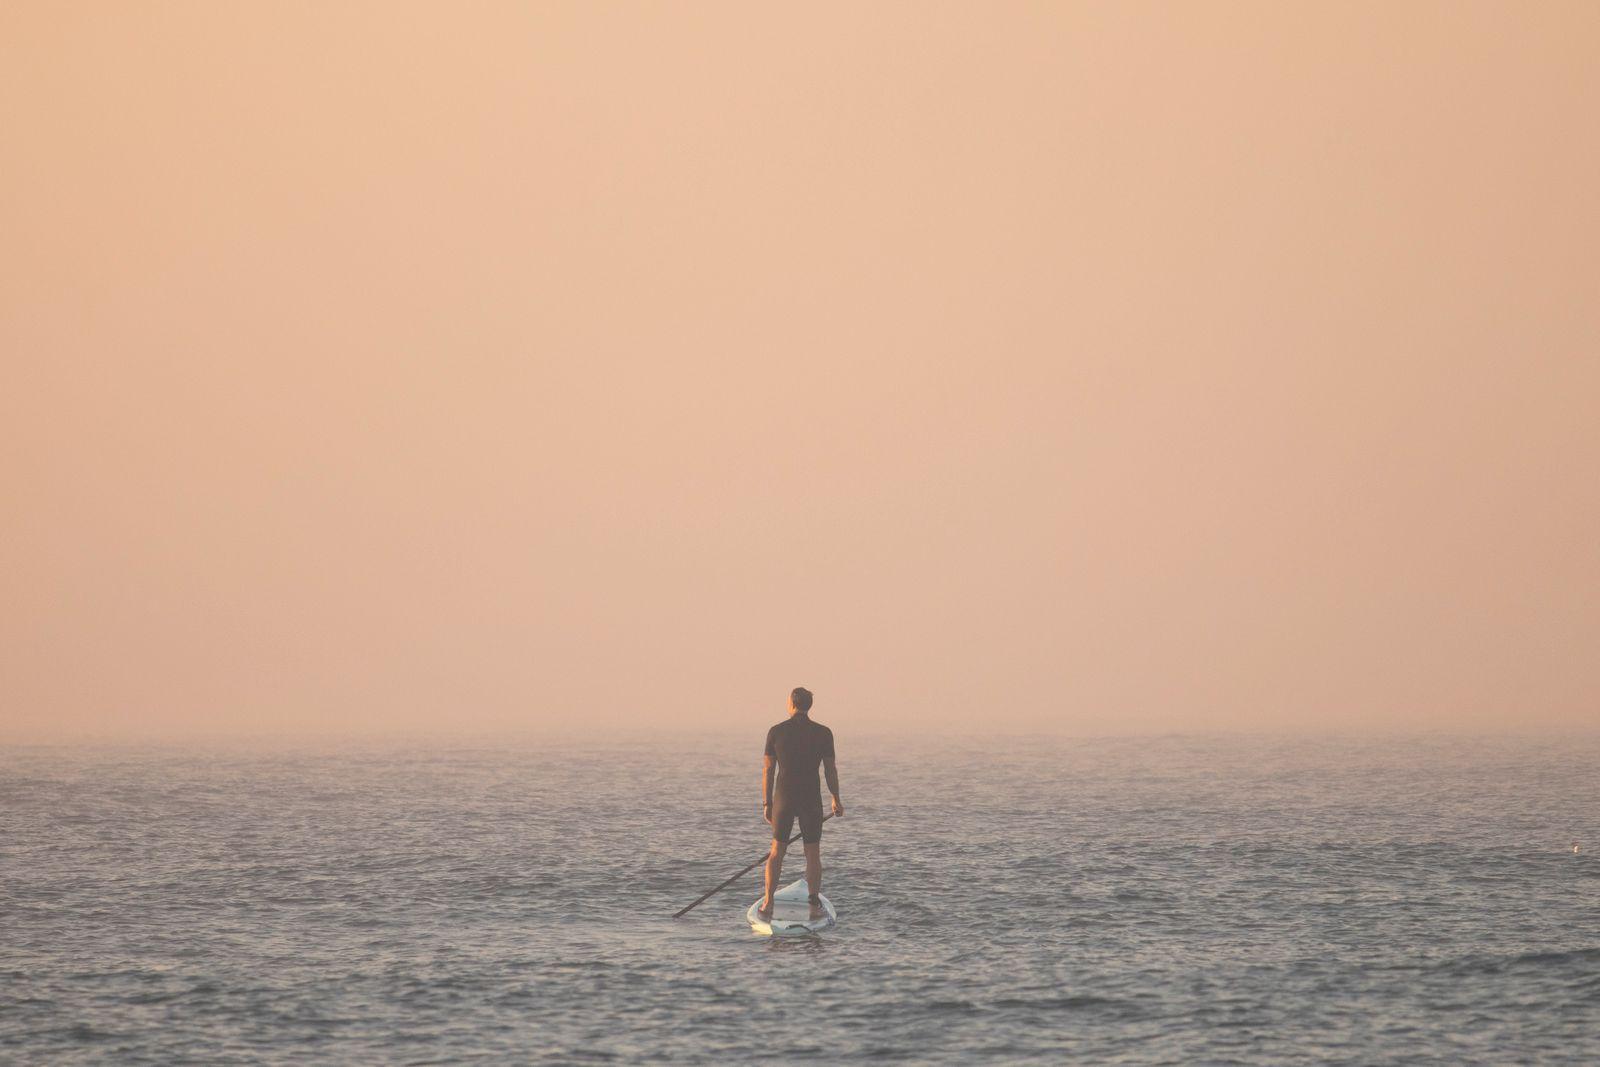 BESTPIX - Fog And Smoke Haze Blanket Sydney